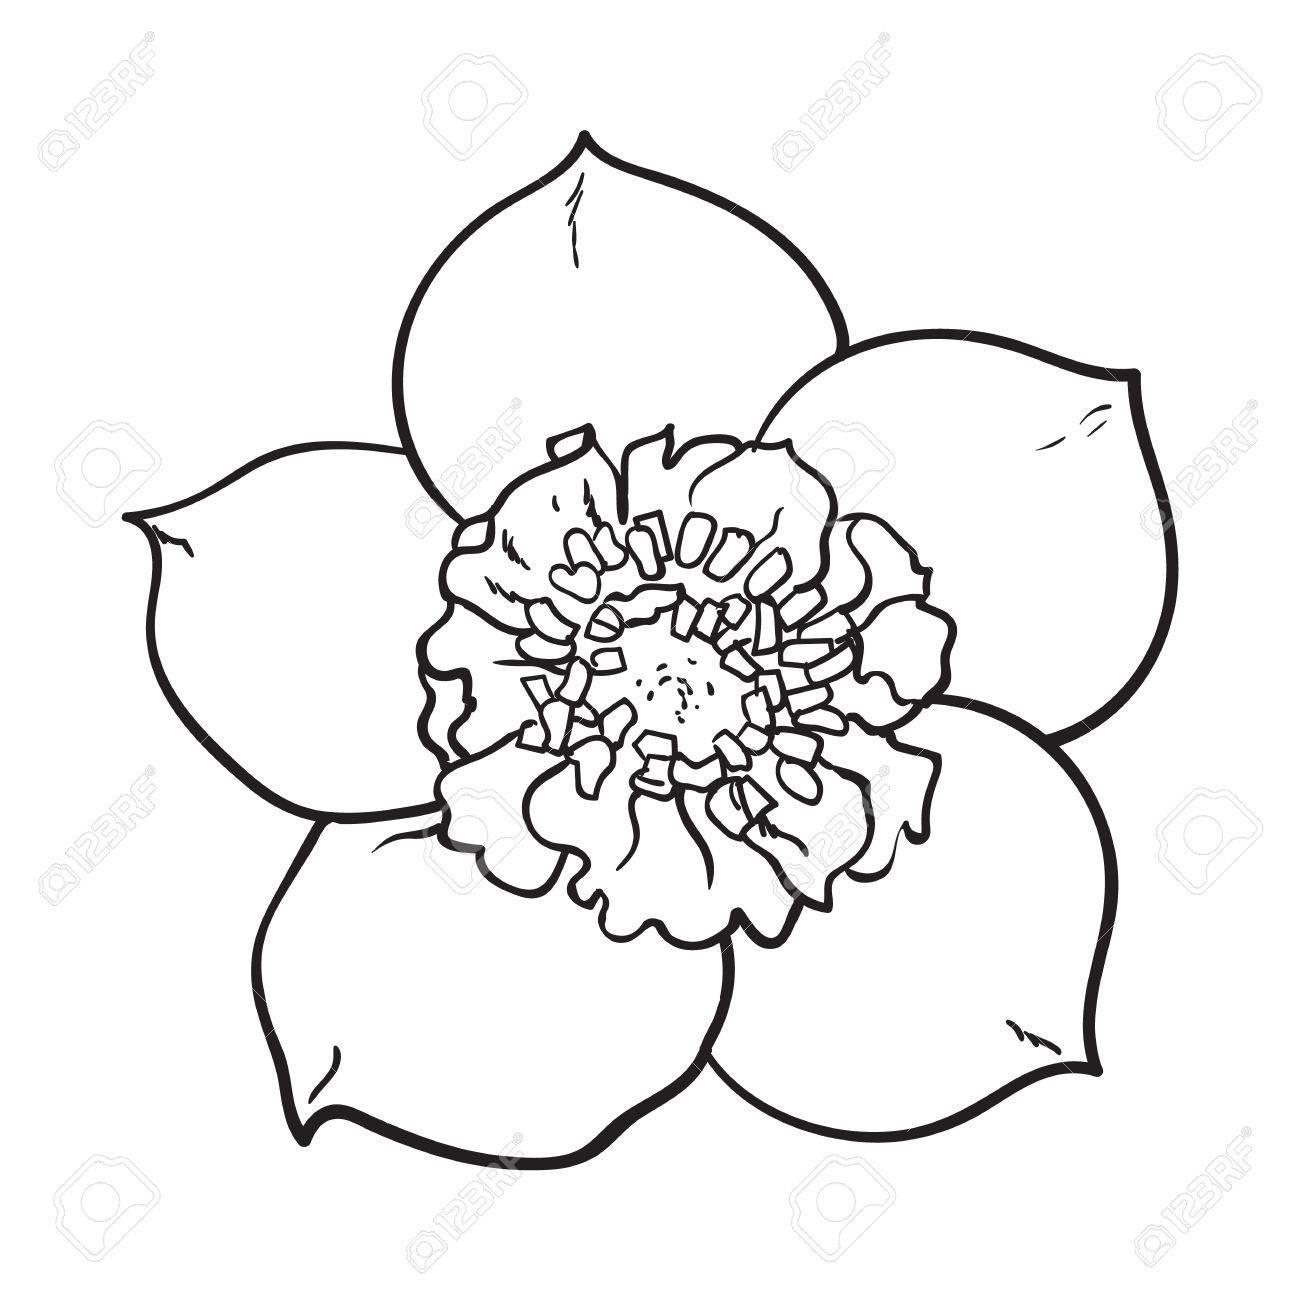 1300x1300 Hellebore, Christmas Rose Single Flower, Top View, Sketch Style